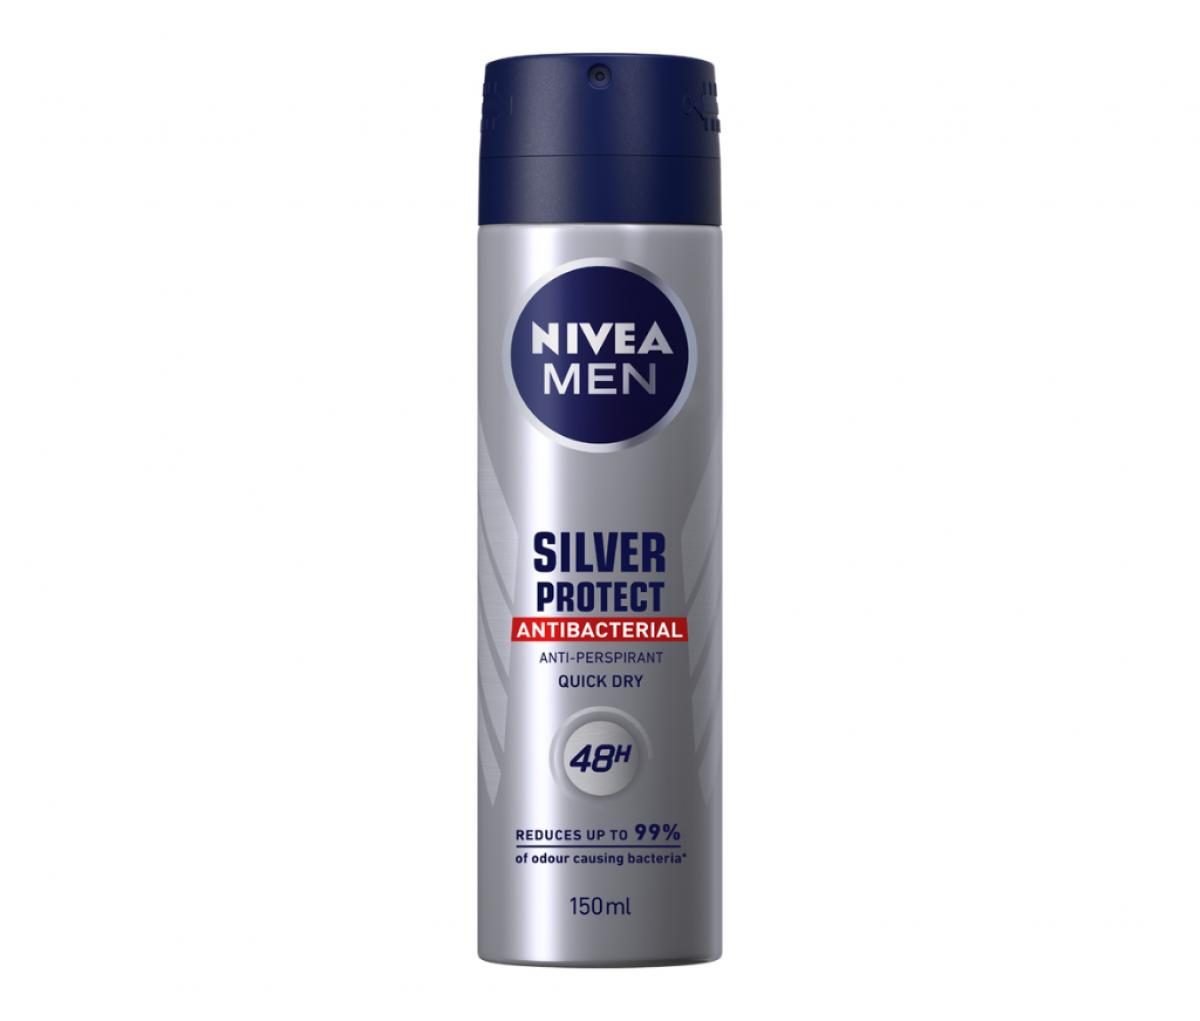 Nivea Deo Men 150ml Silver Protect